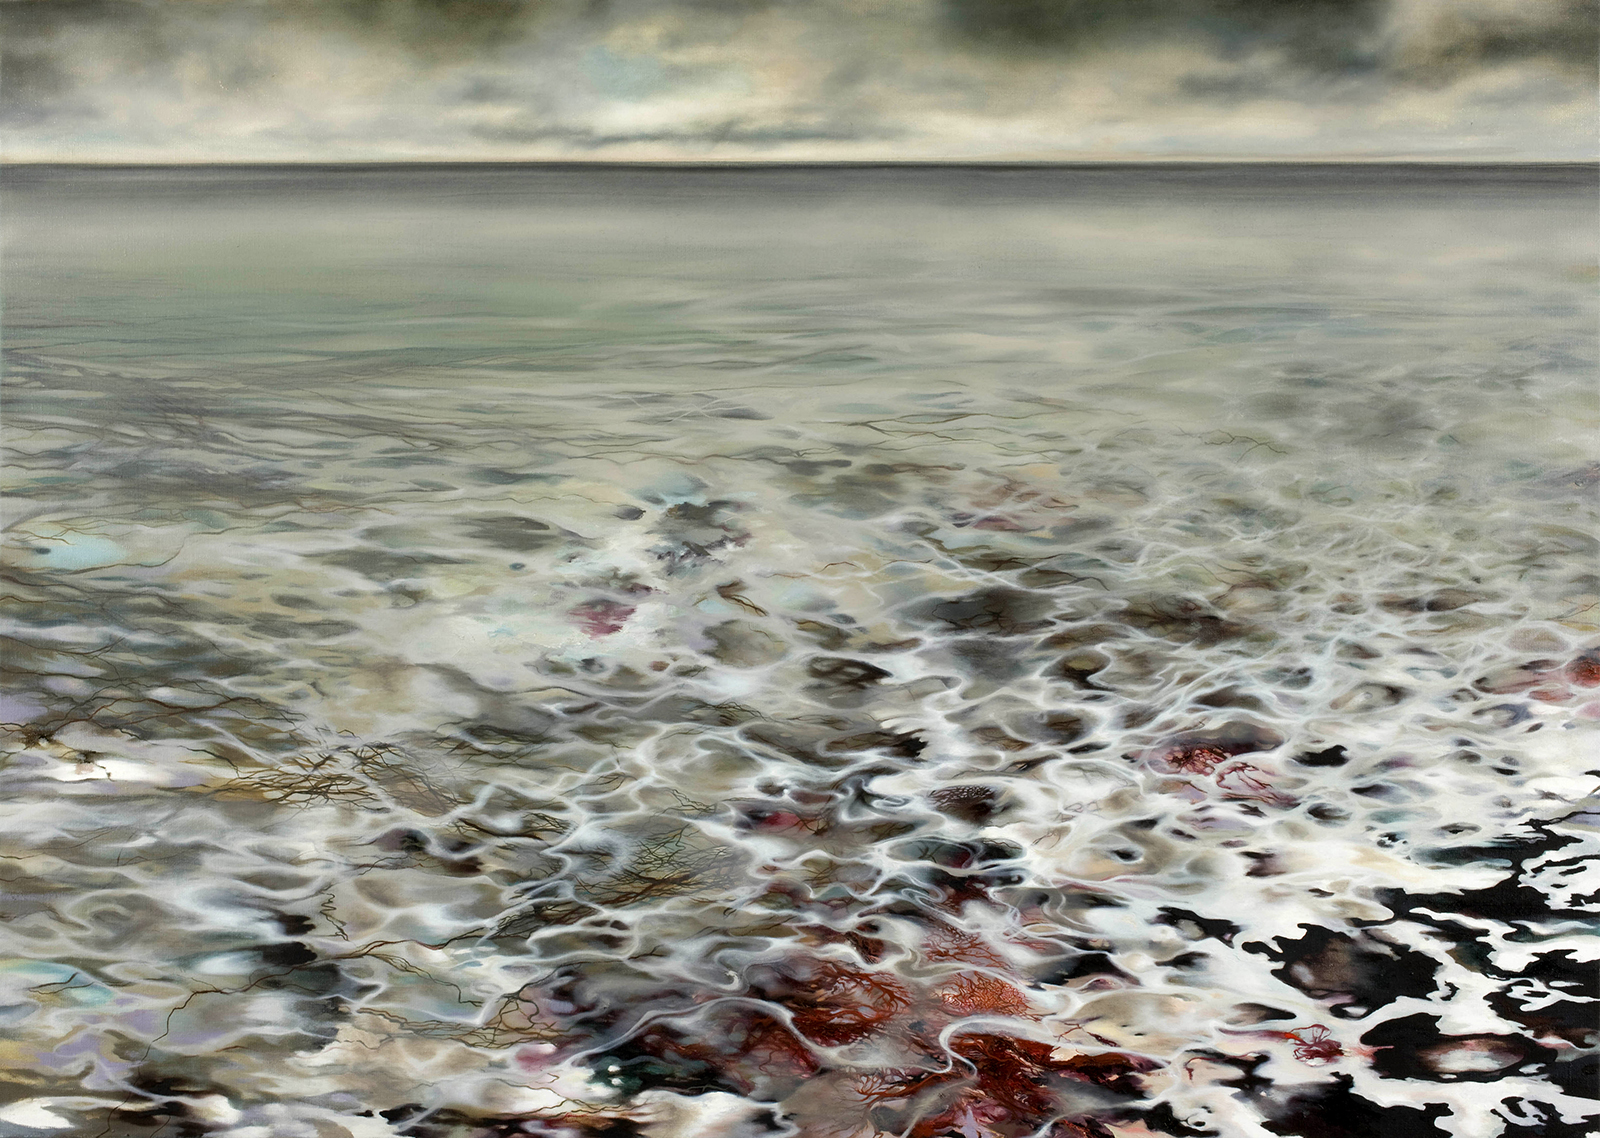 Meeresgrund 2005, 100 x 140 cm, Öl auf Leinwand  Ocean Floor 2005, oil on canvas